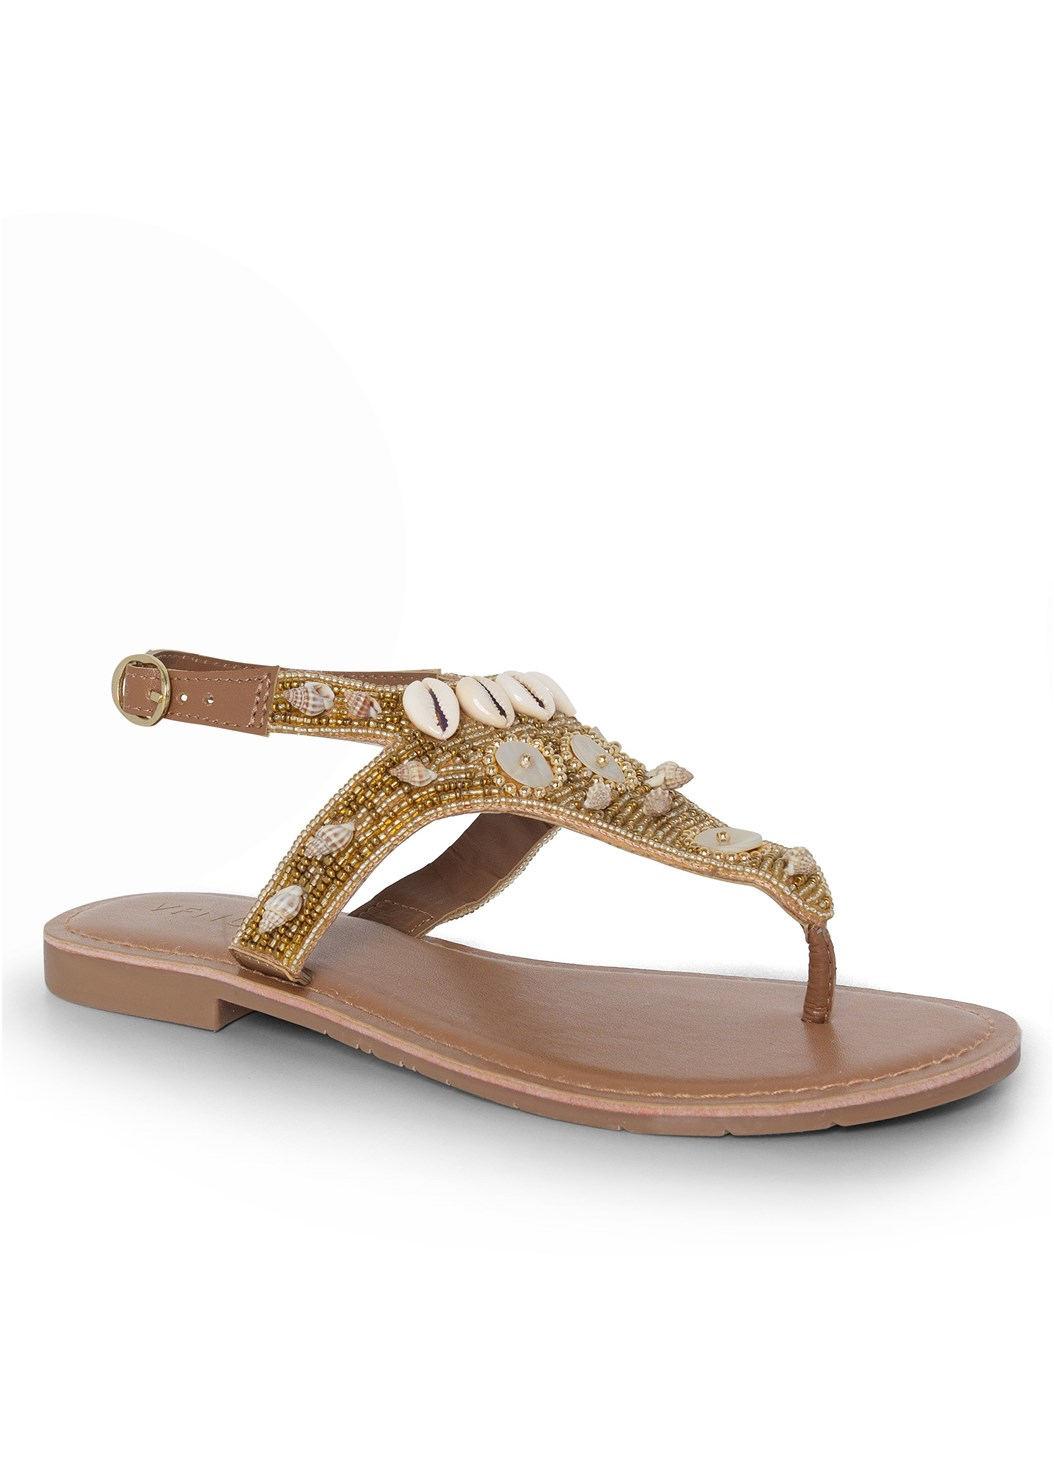 Shell Detail Sandals